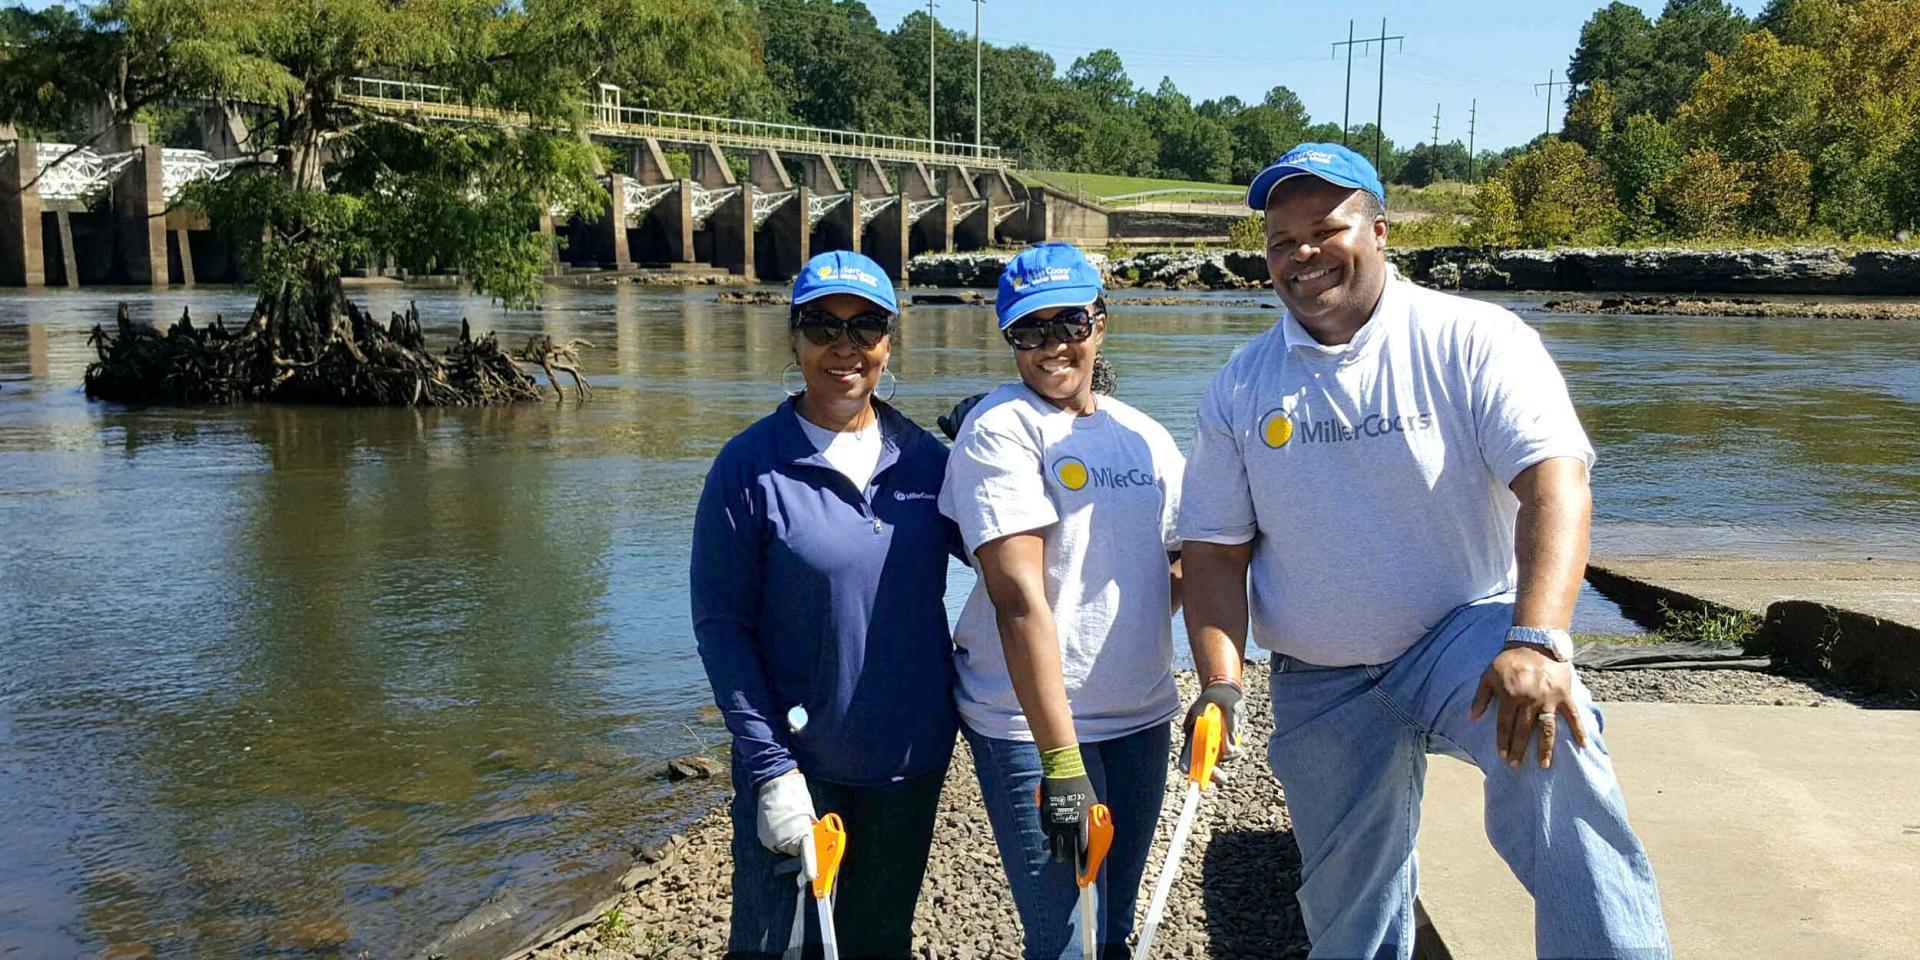 Miller coors volunteers at river